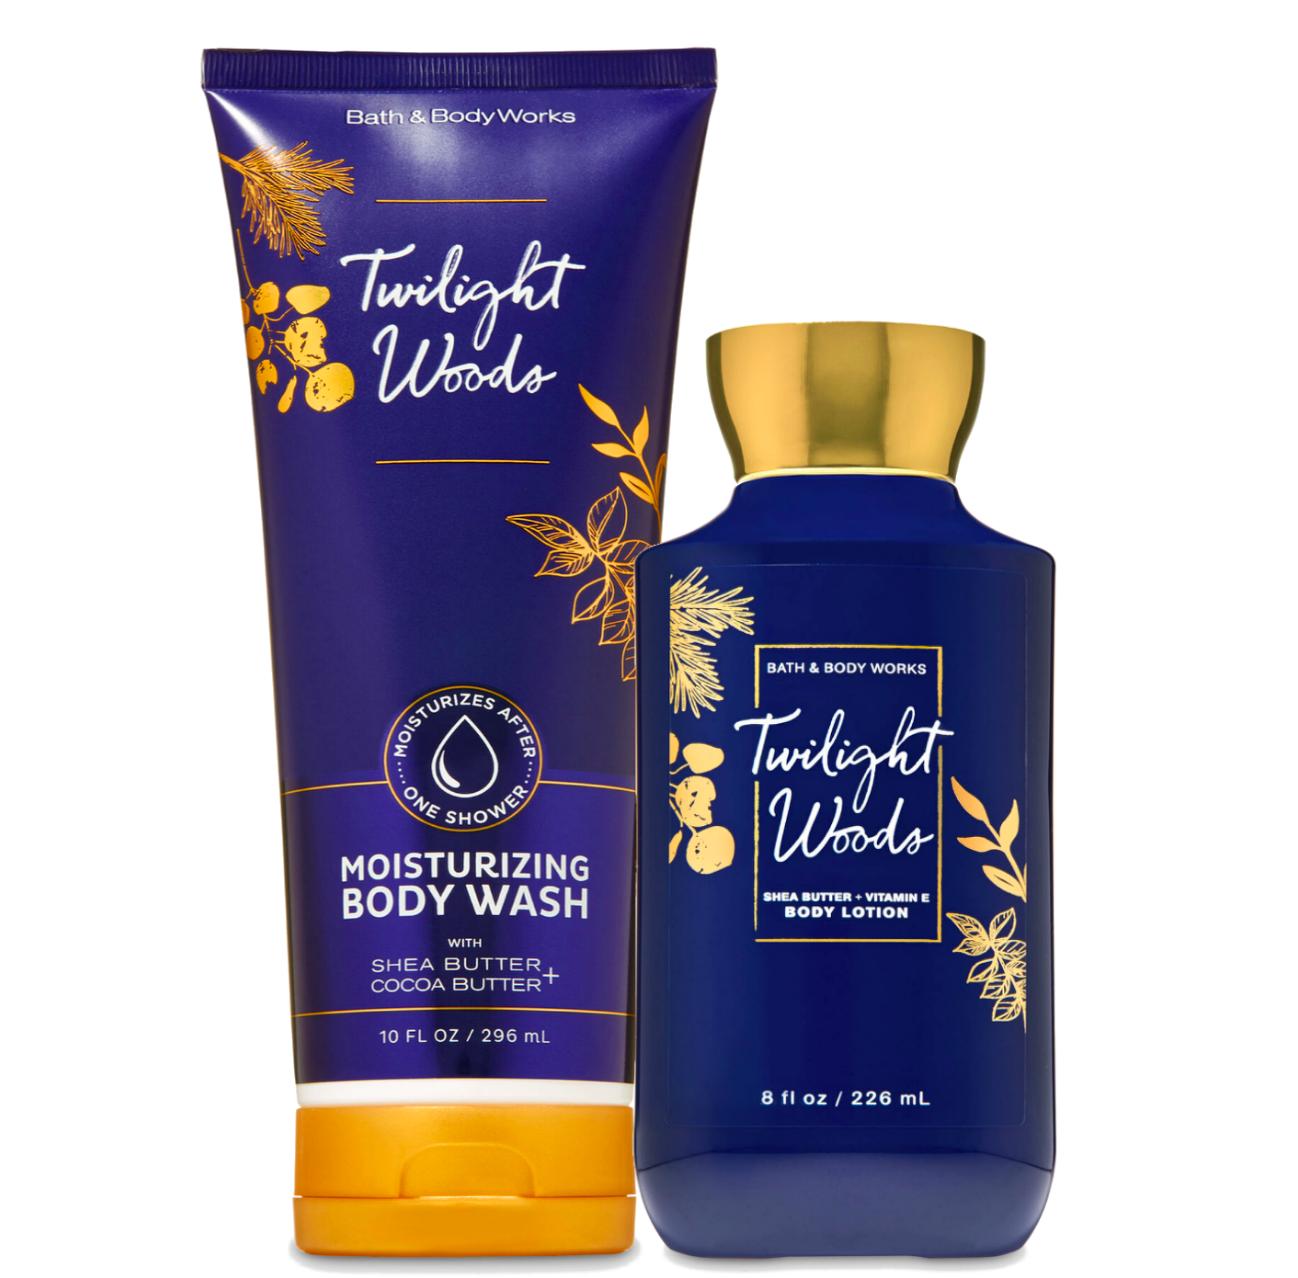 Bath & Body Works Twilight Woods Body Lotion + Moisturizing Body Wash Duo Set - $31.95